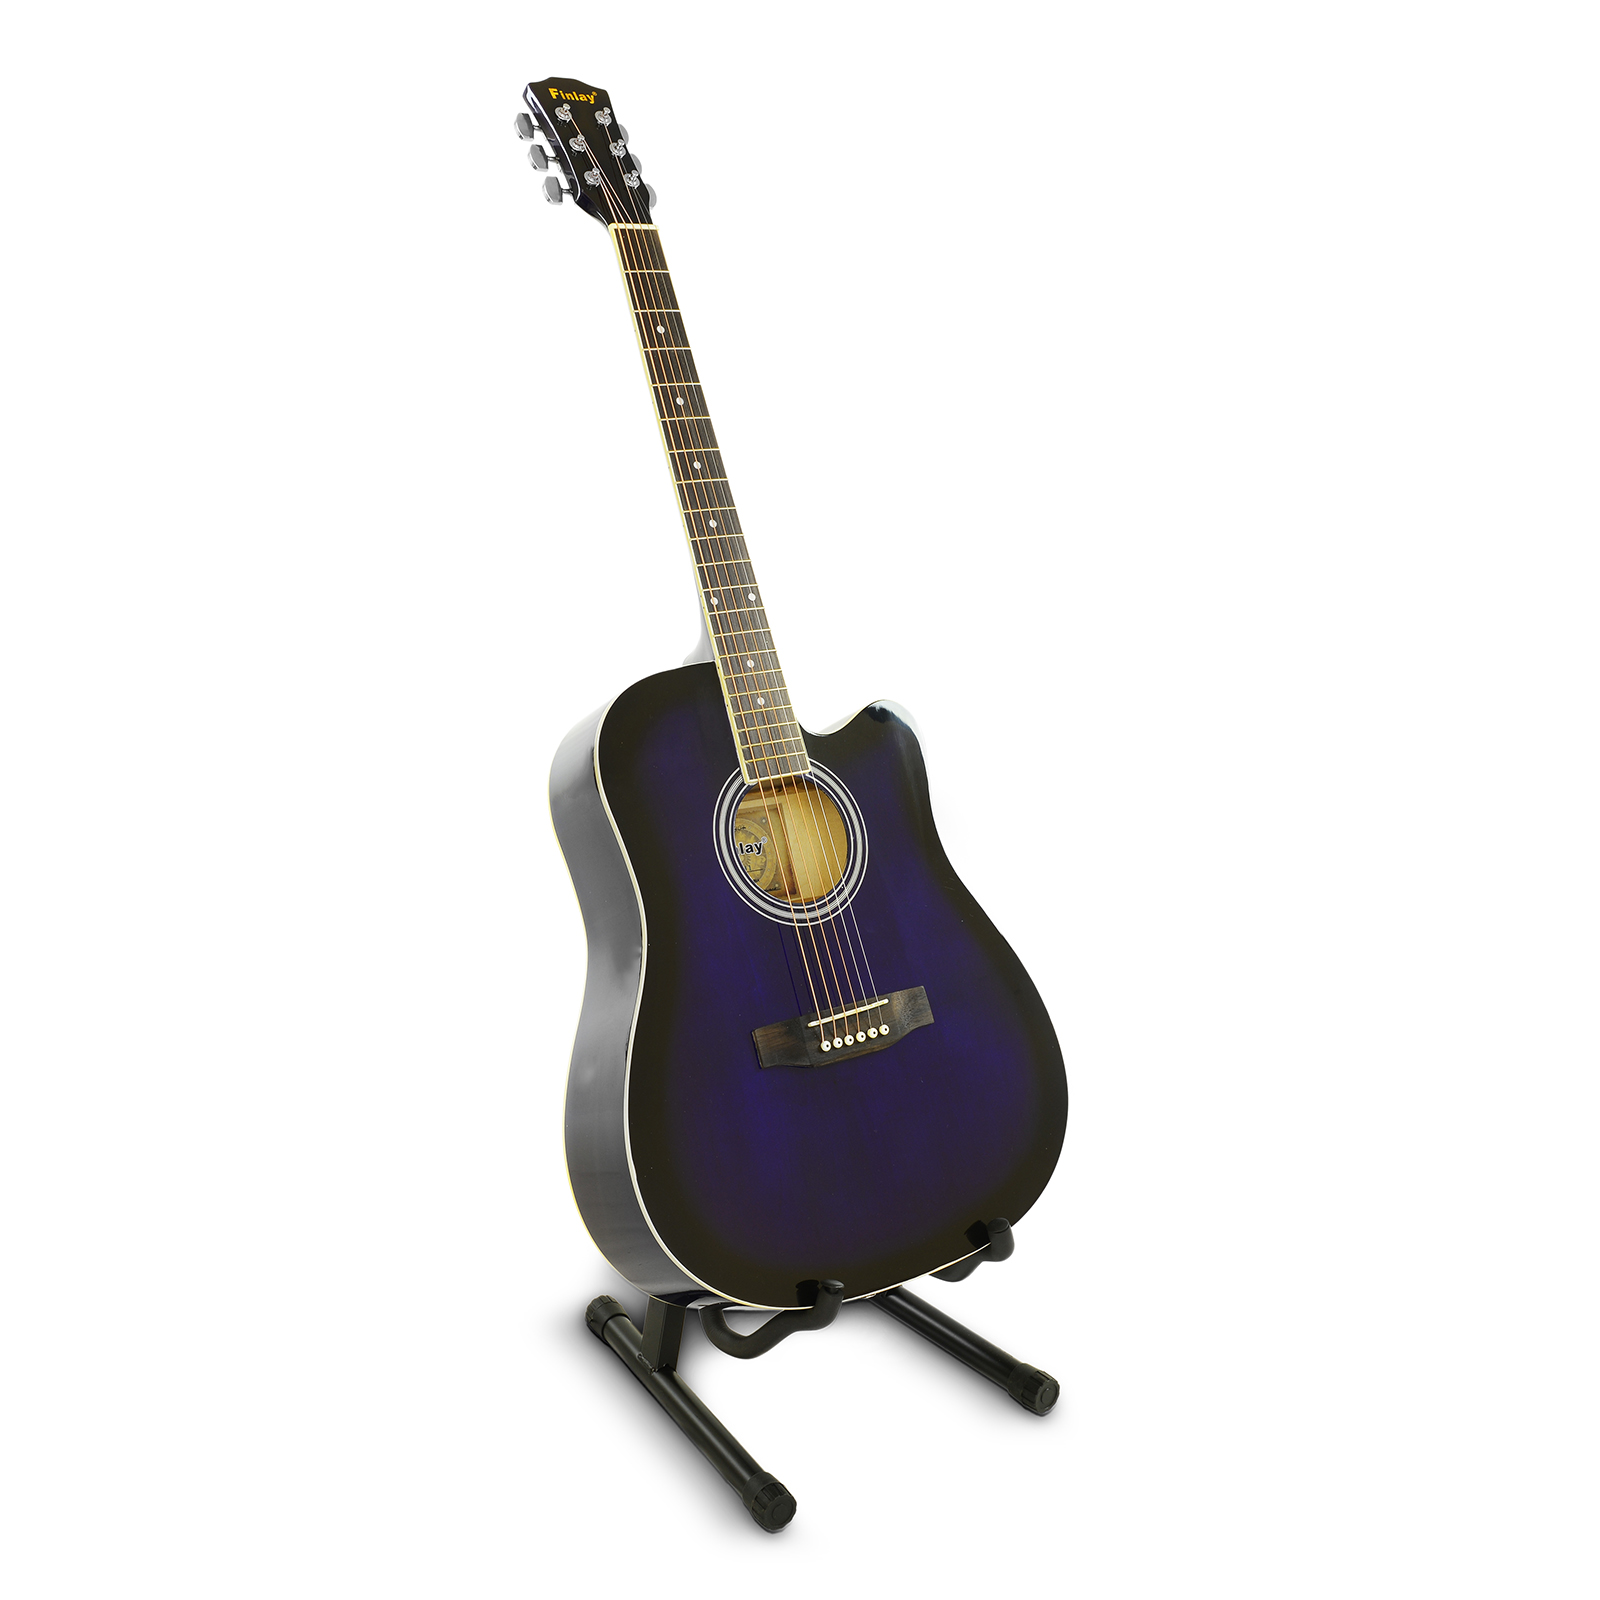 41-034-Inch-Wooden-Guitar-Set-Folk-Acoustic-Classical-Cutaway-Steel-String-Bag